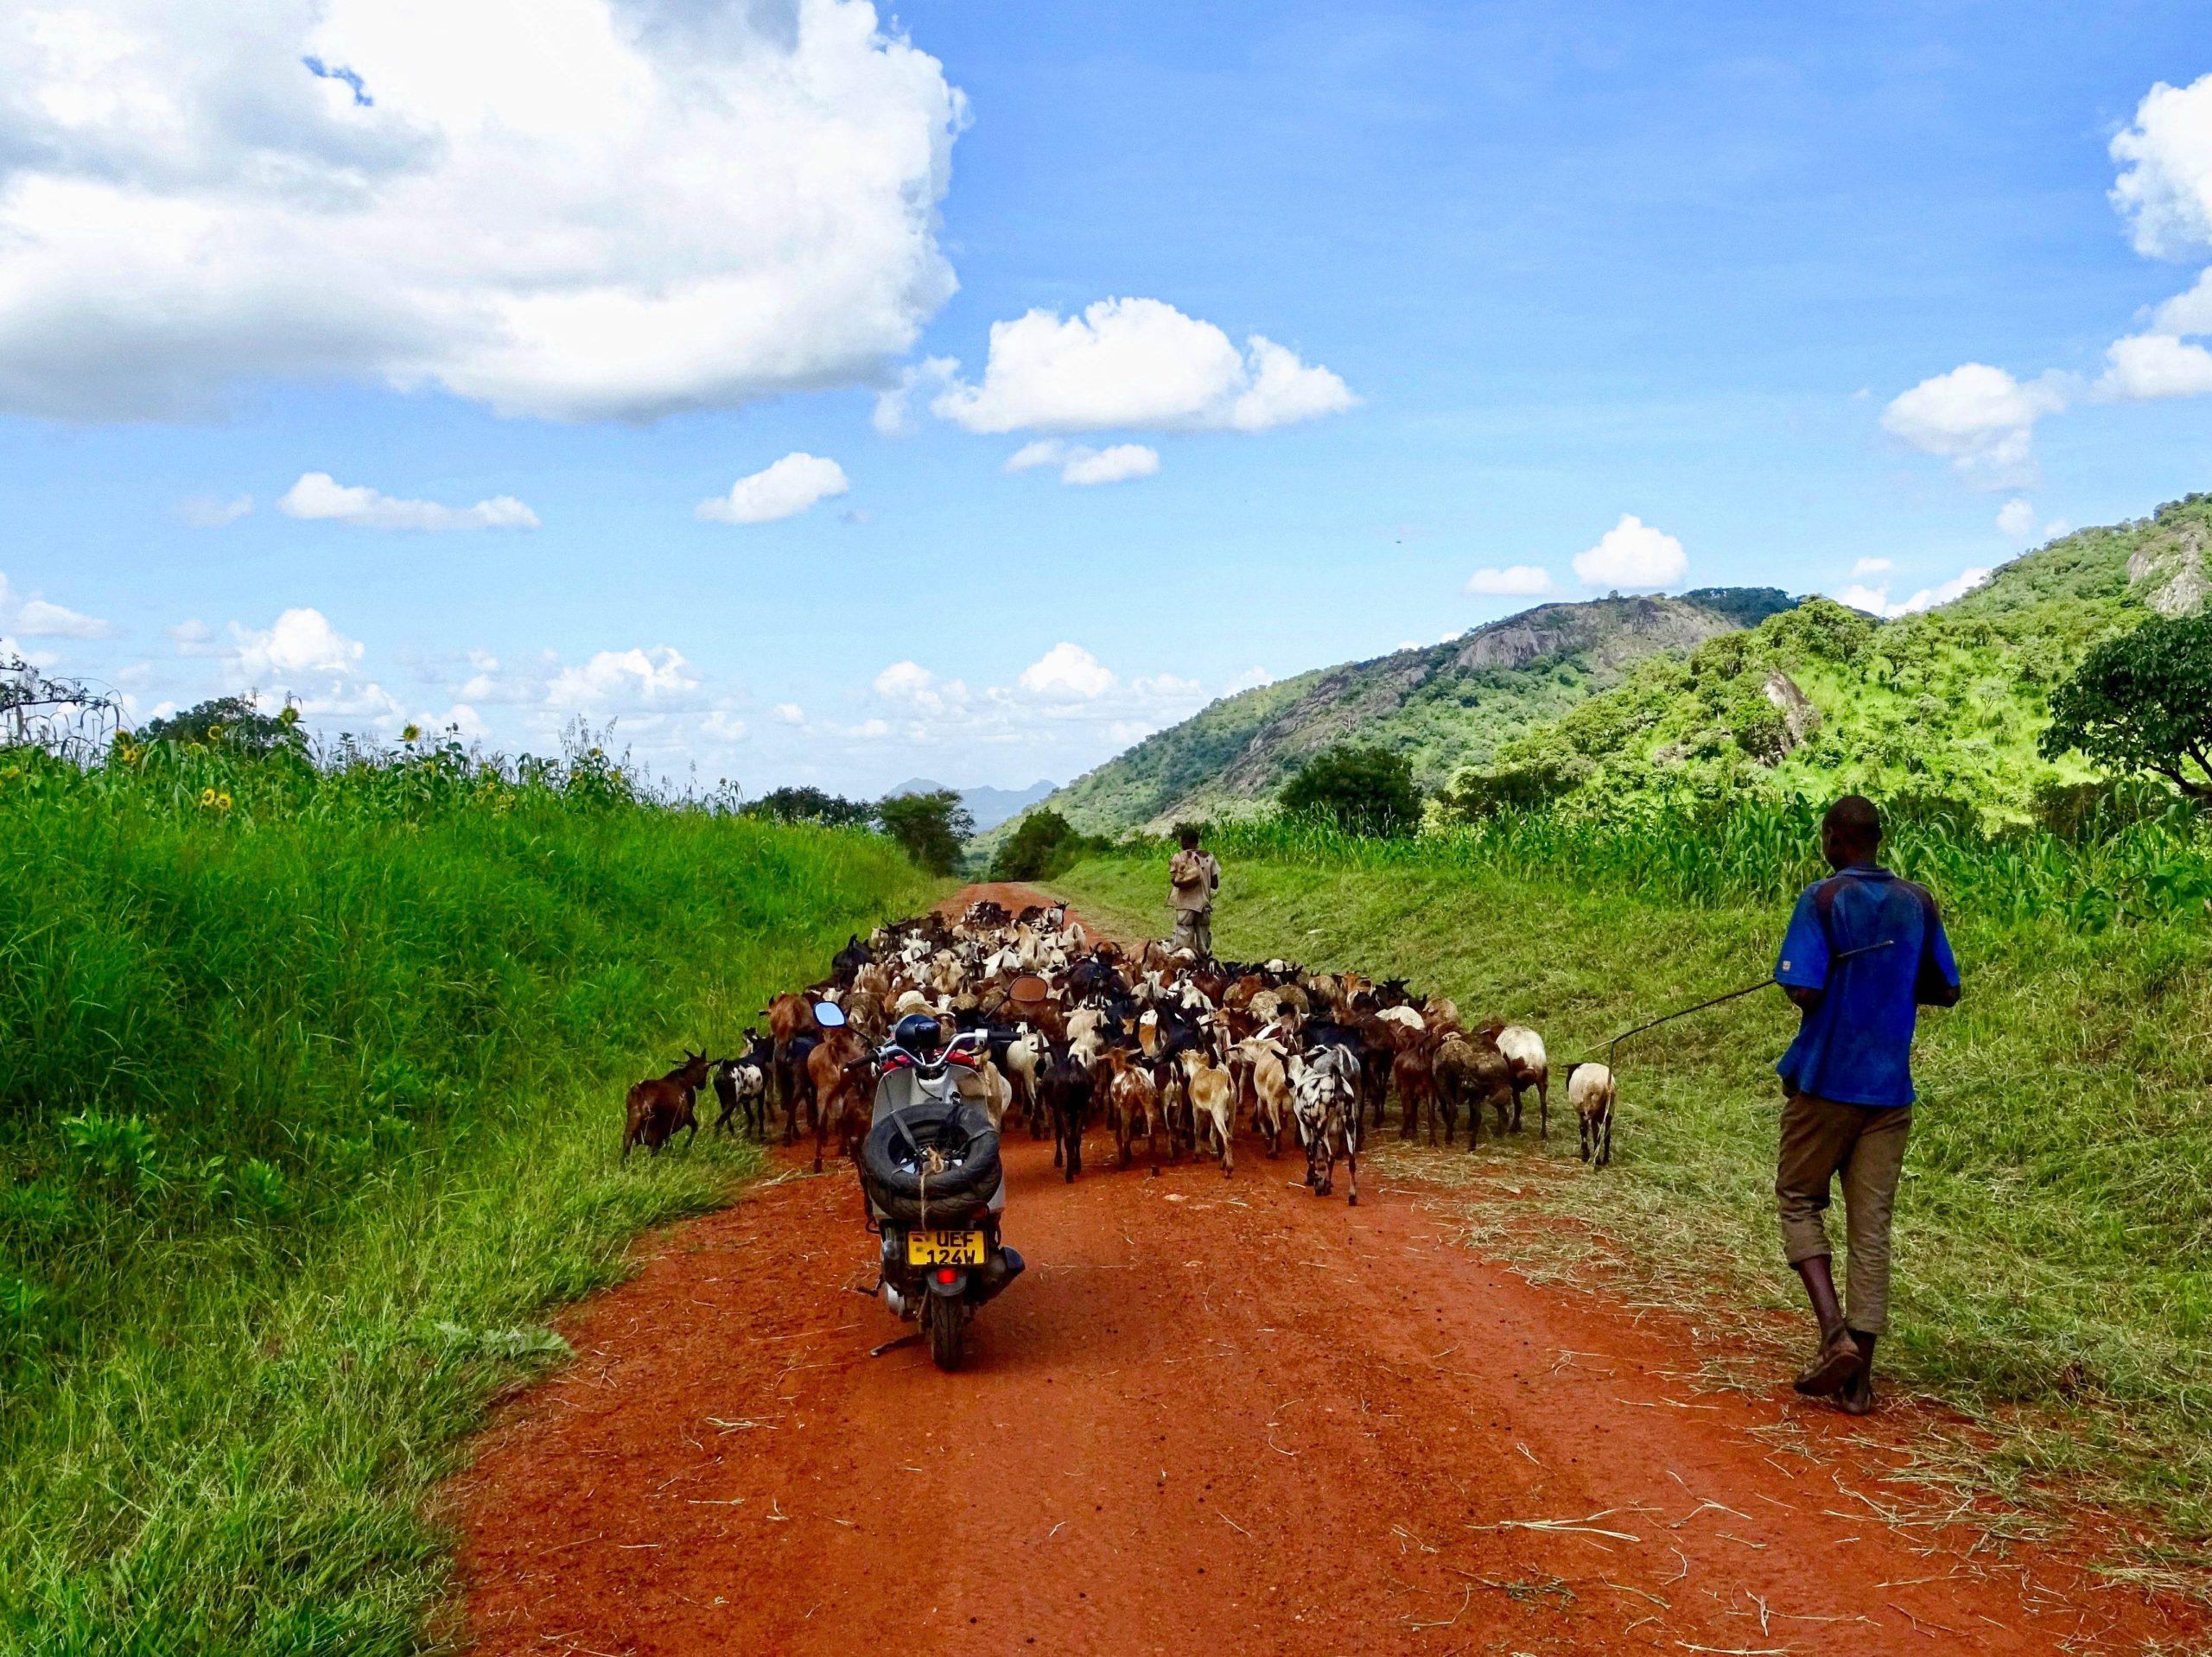 Filevorming op weg naar Kidepo